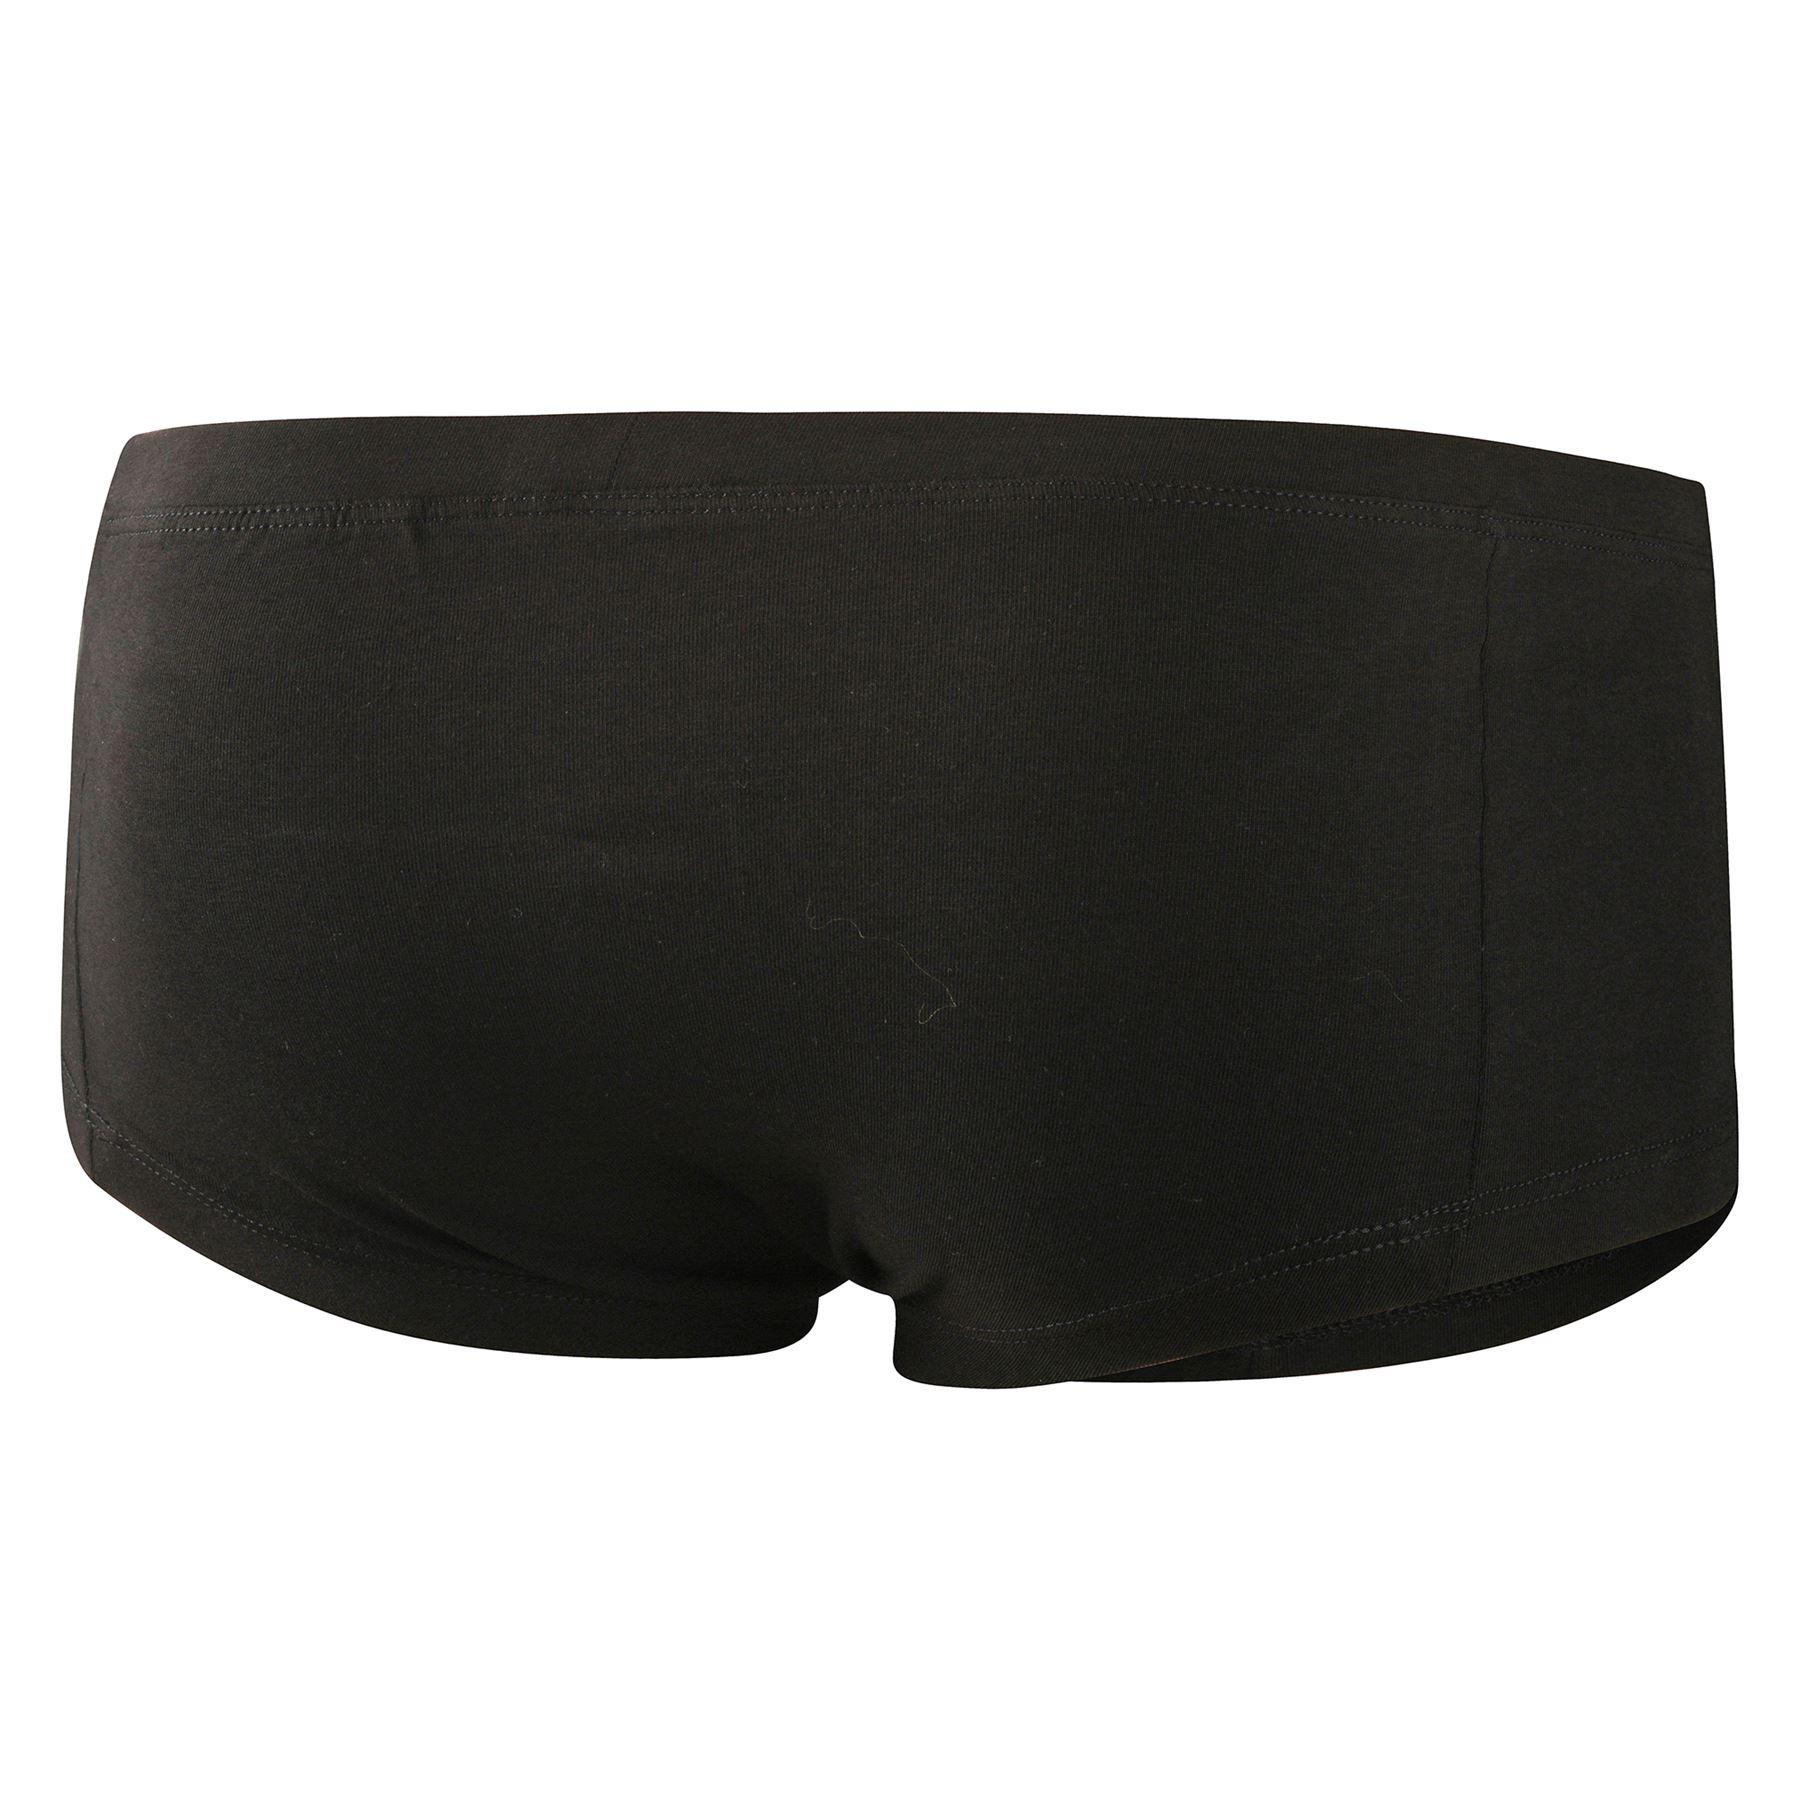 Doreanse-1750-Adonis-Anatomical-Trunk-Supportive-Enhancing-Men-039-s-underwear miniatuur 13